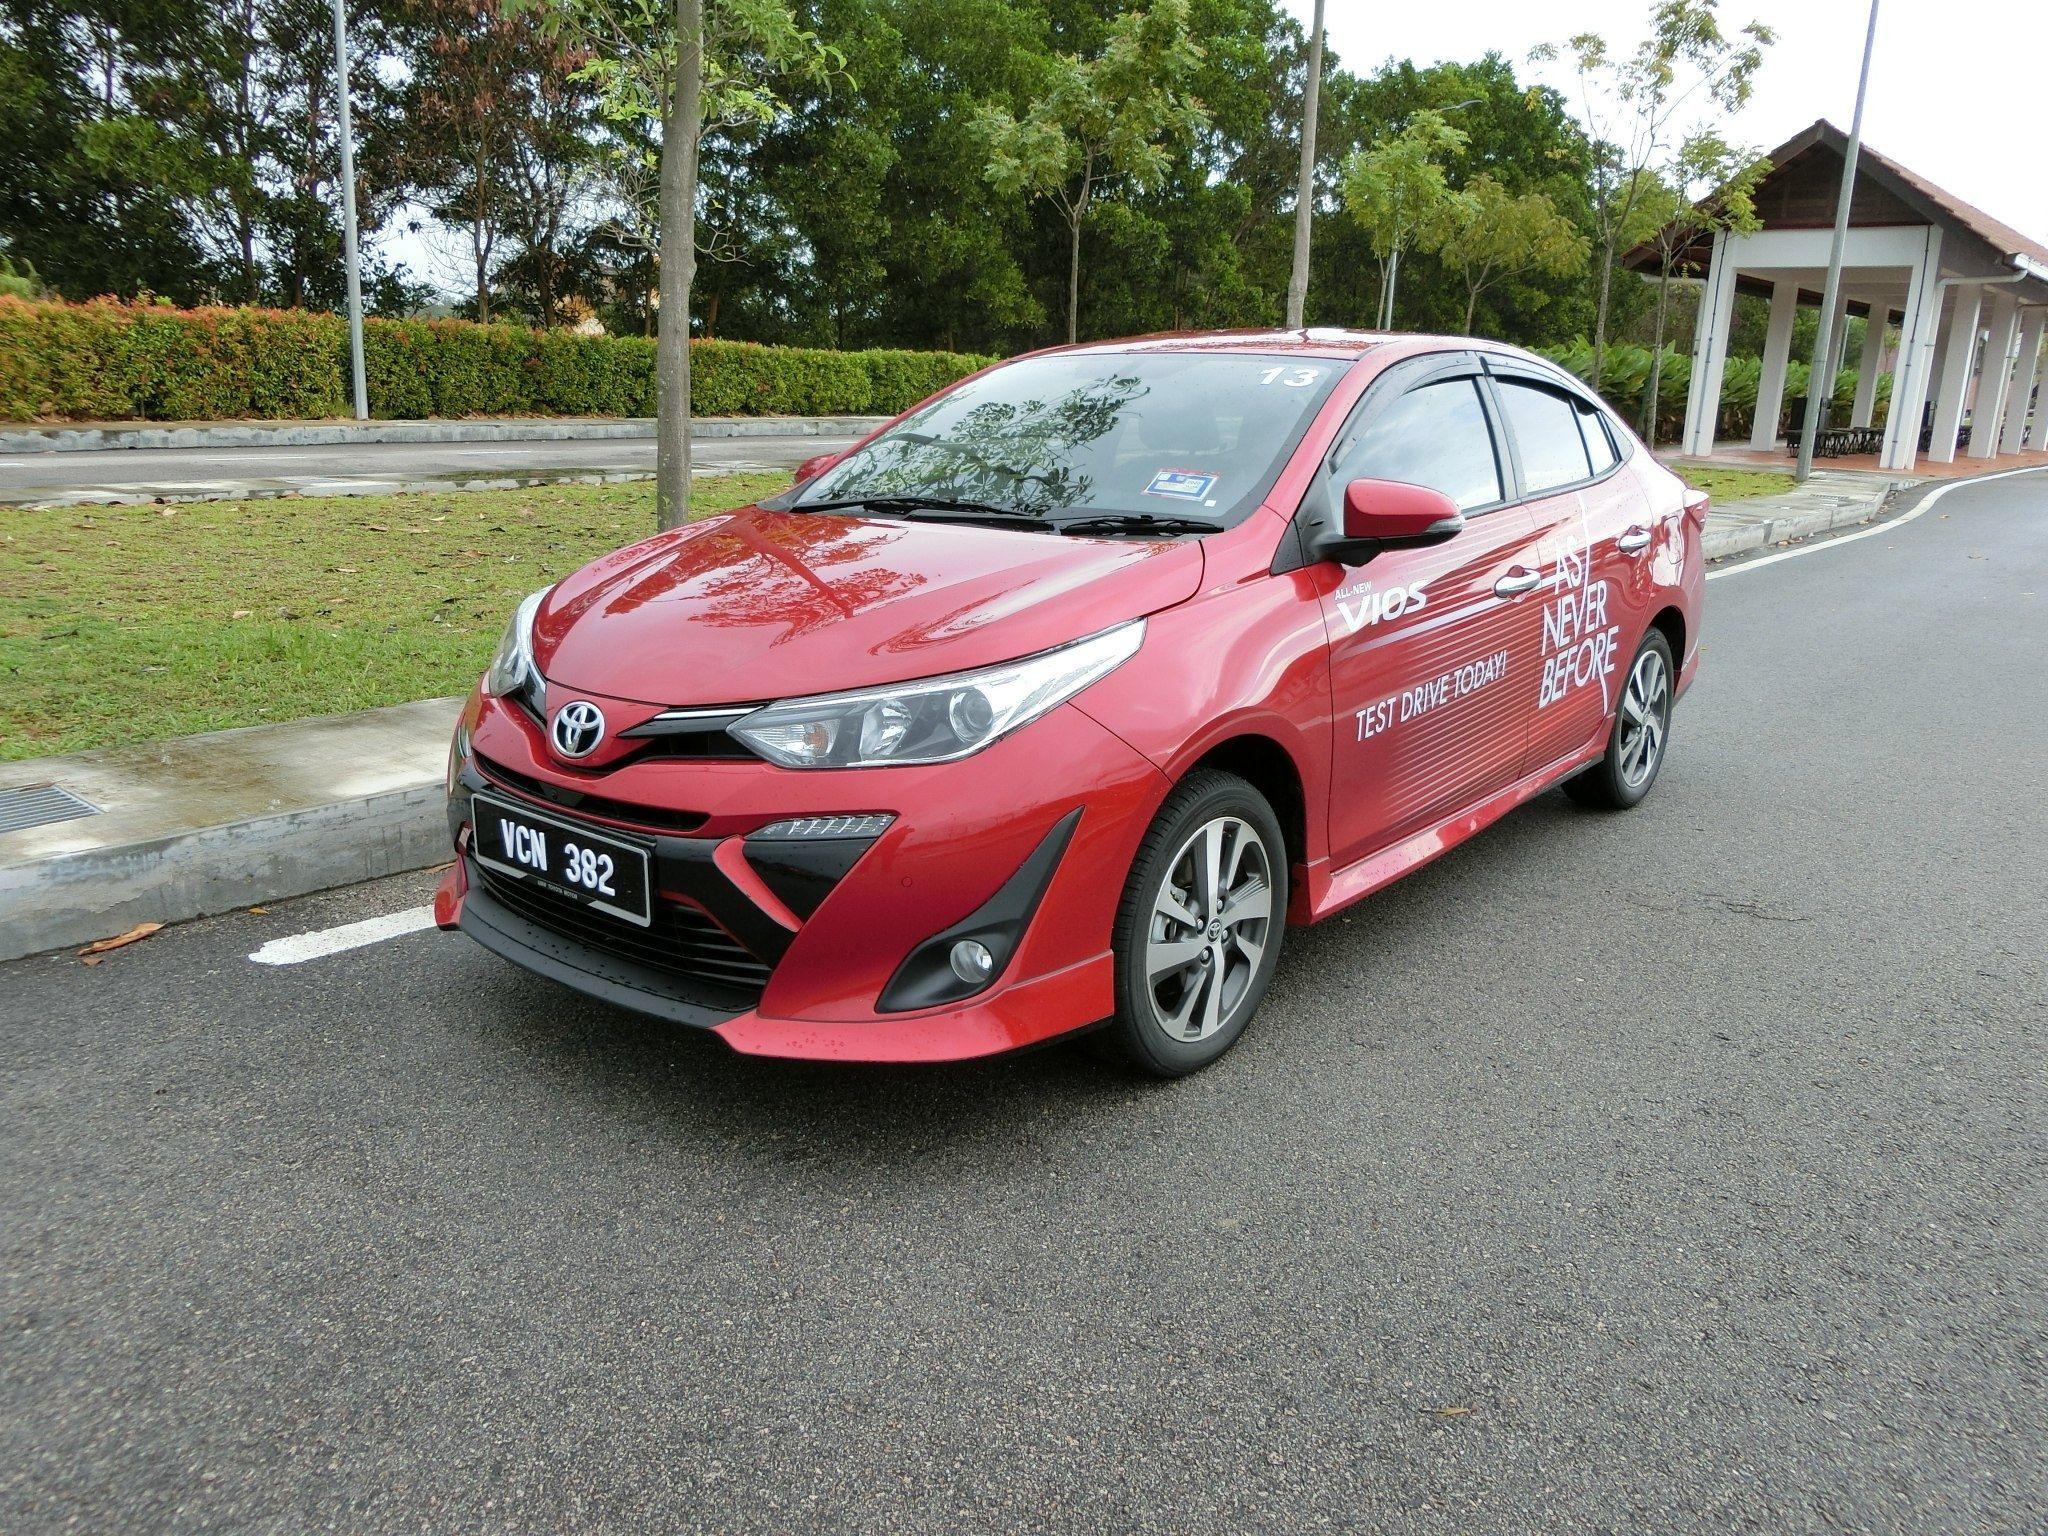 Toyota Vios 2020 Malaysia Price New Release Di 2020 Modifikasi Mobil Mobil